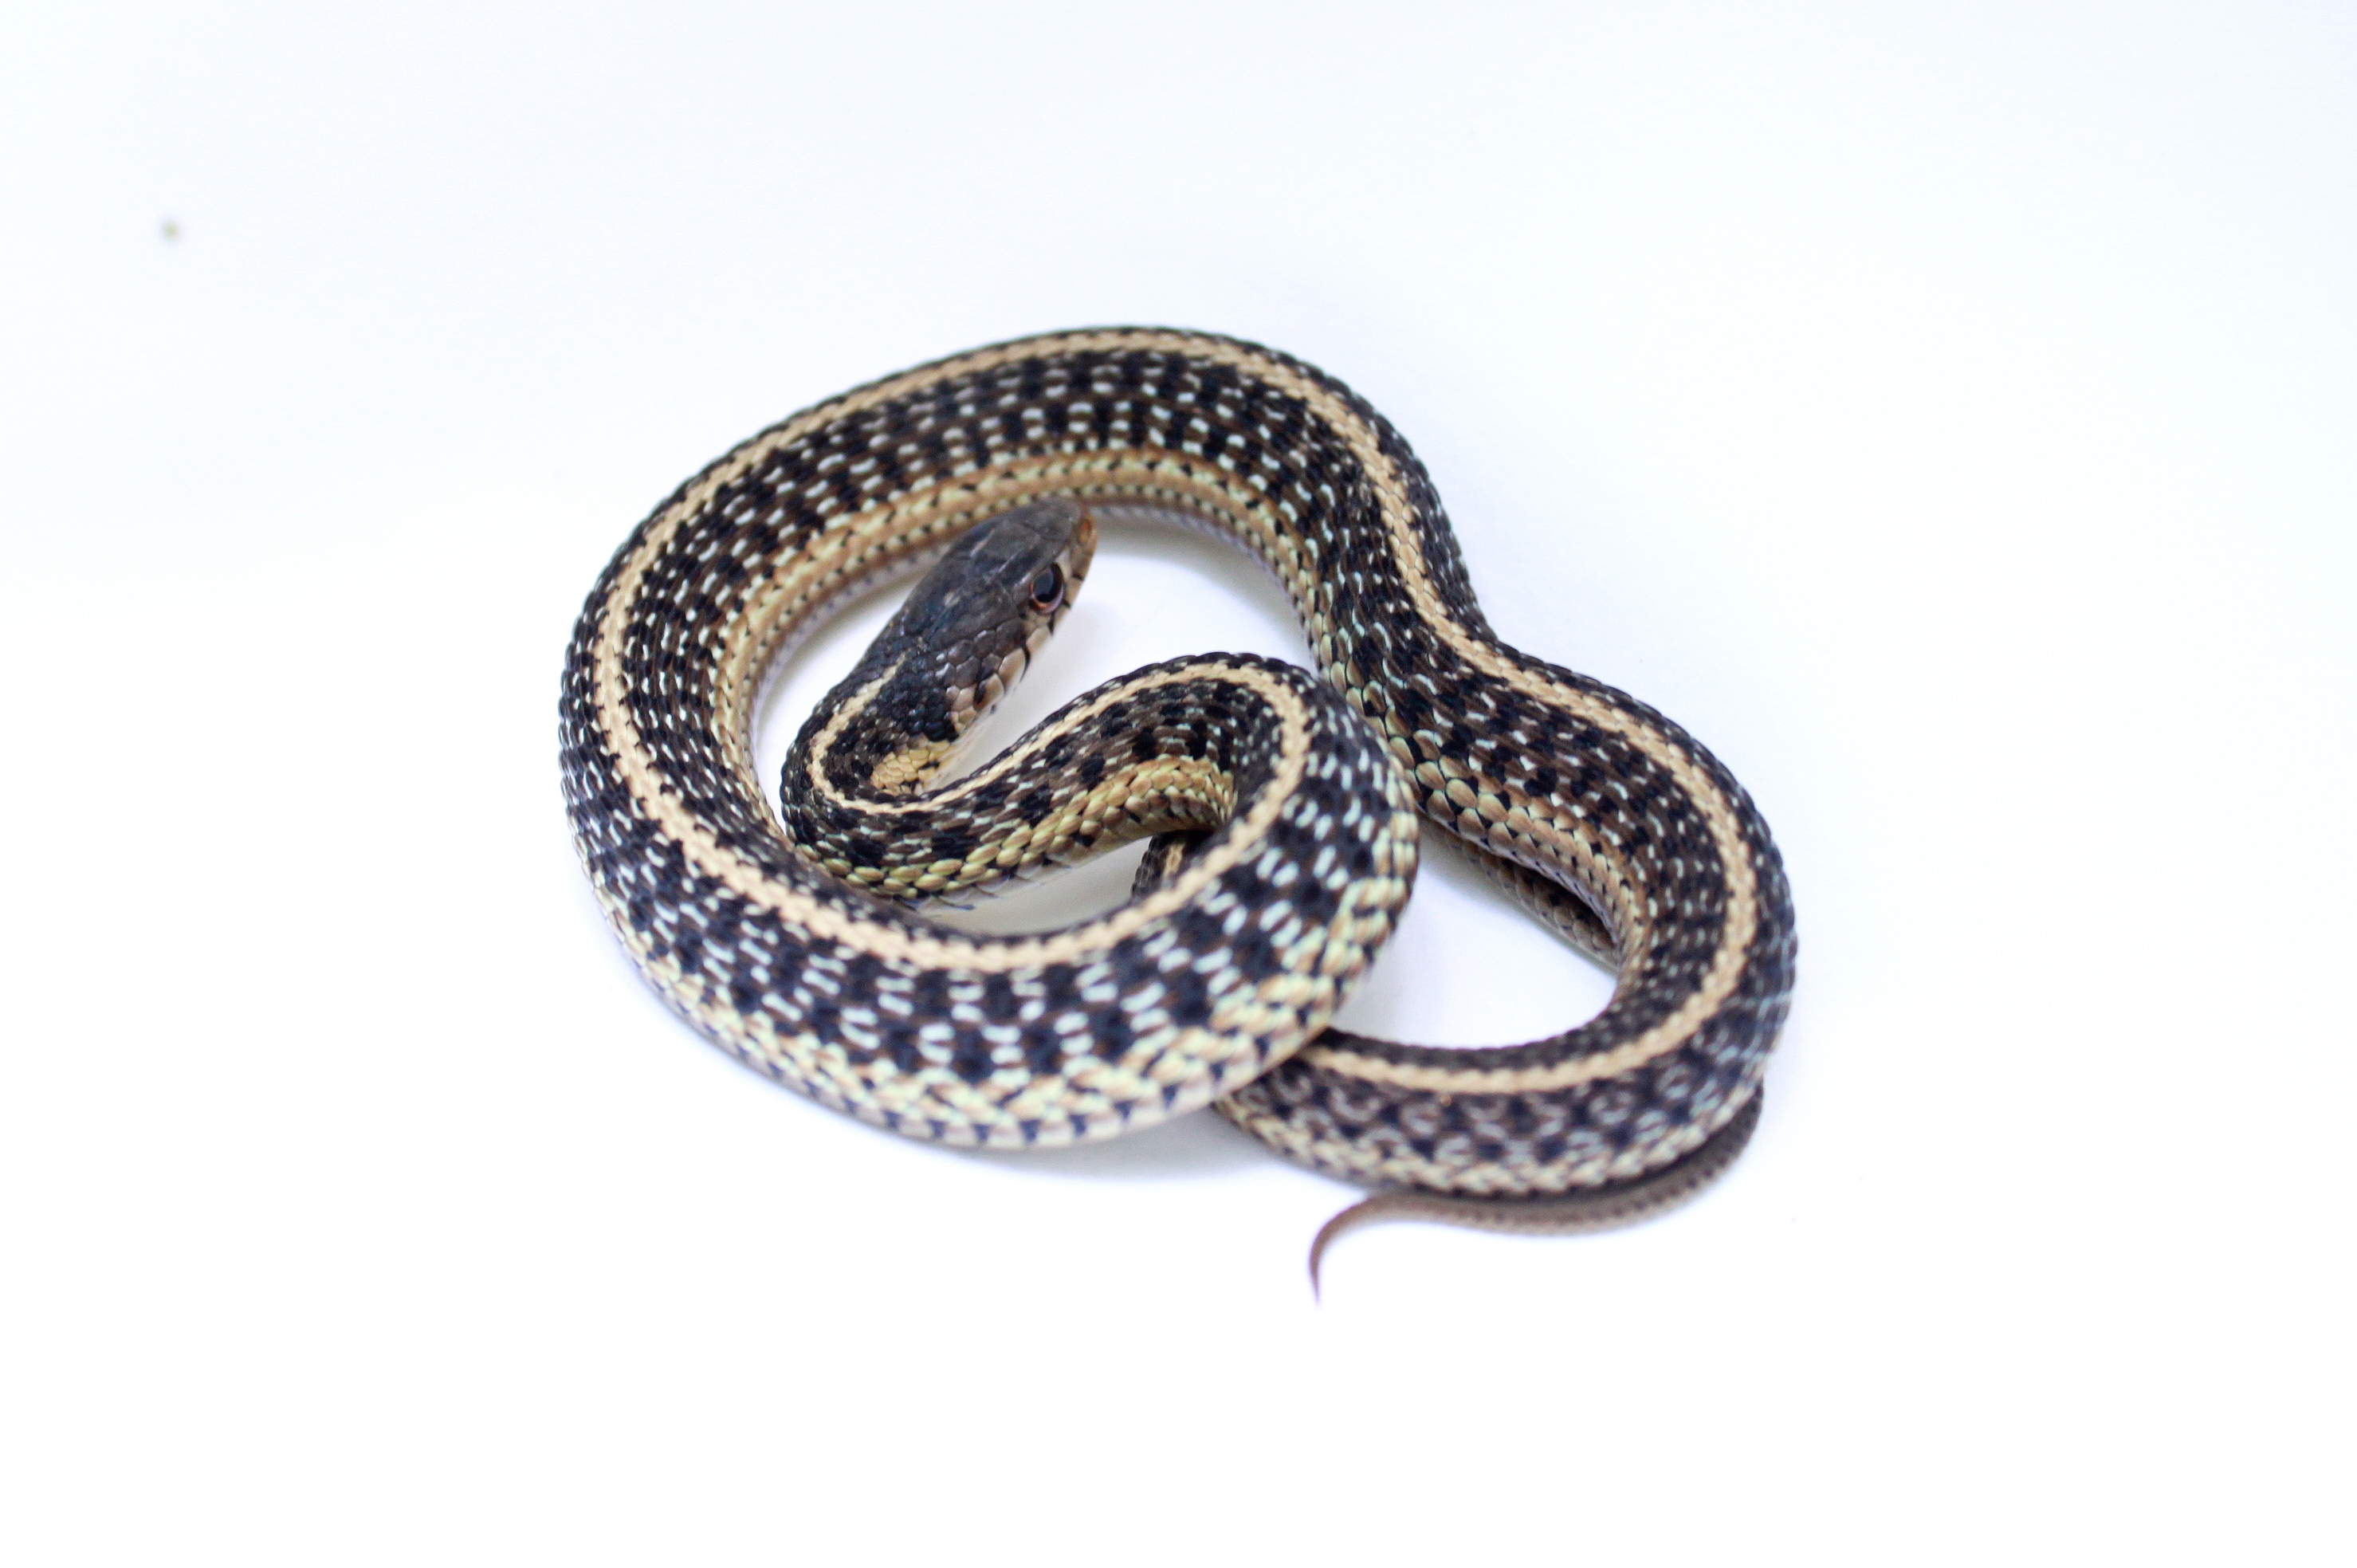 Garter Snake svg #9, Download drawings